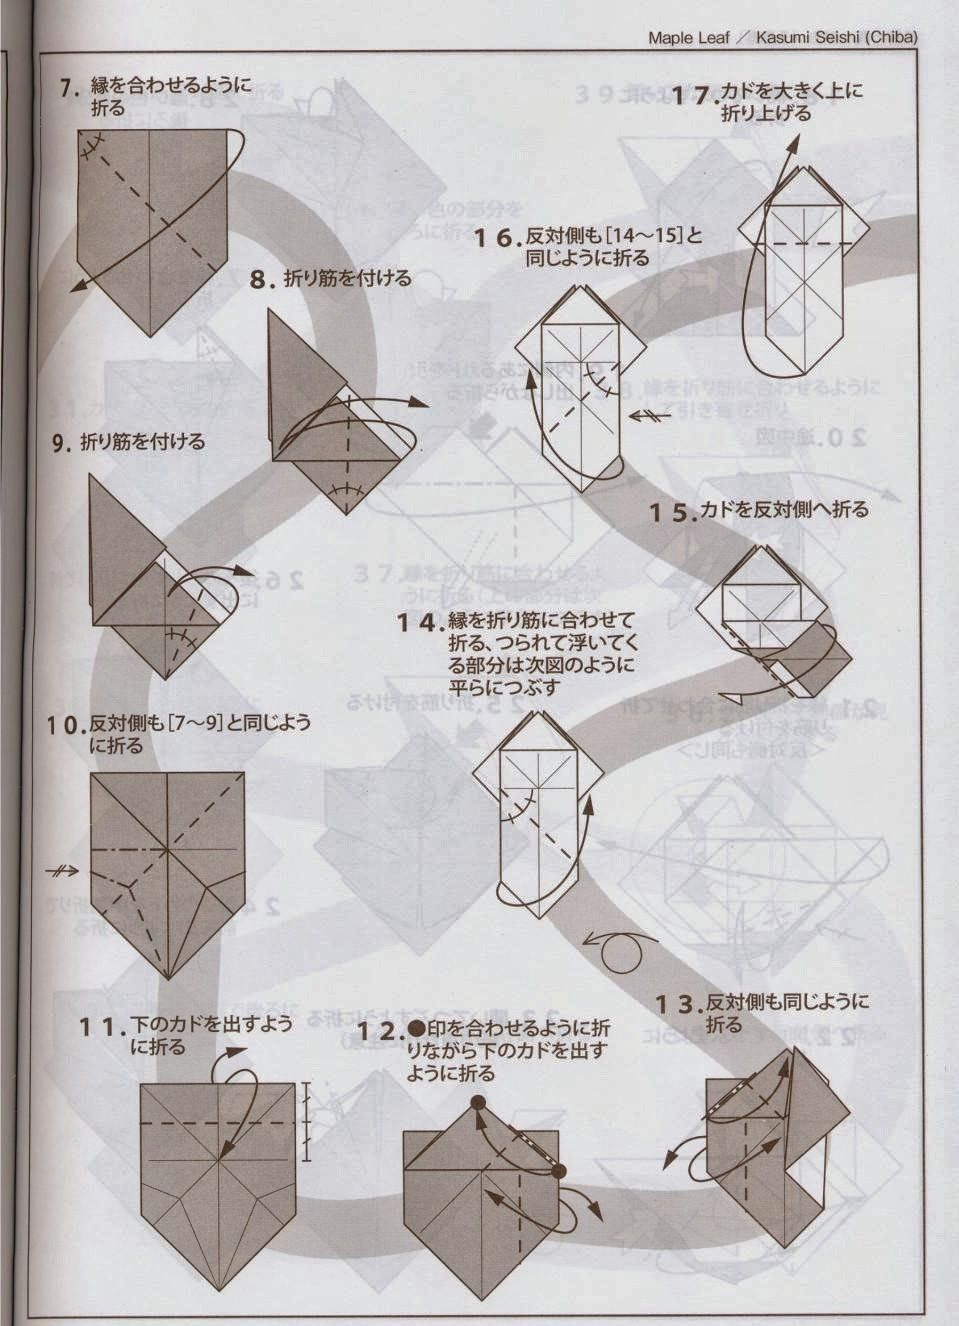 Maple Leaf Kasumi Seishi Ver225 2 Origami Pinterest Kusudama Diagrams